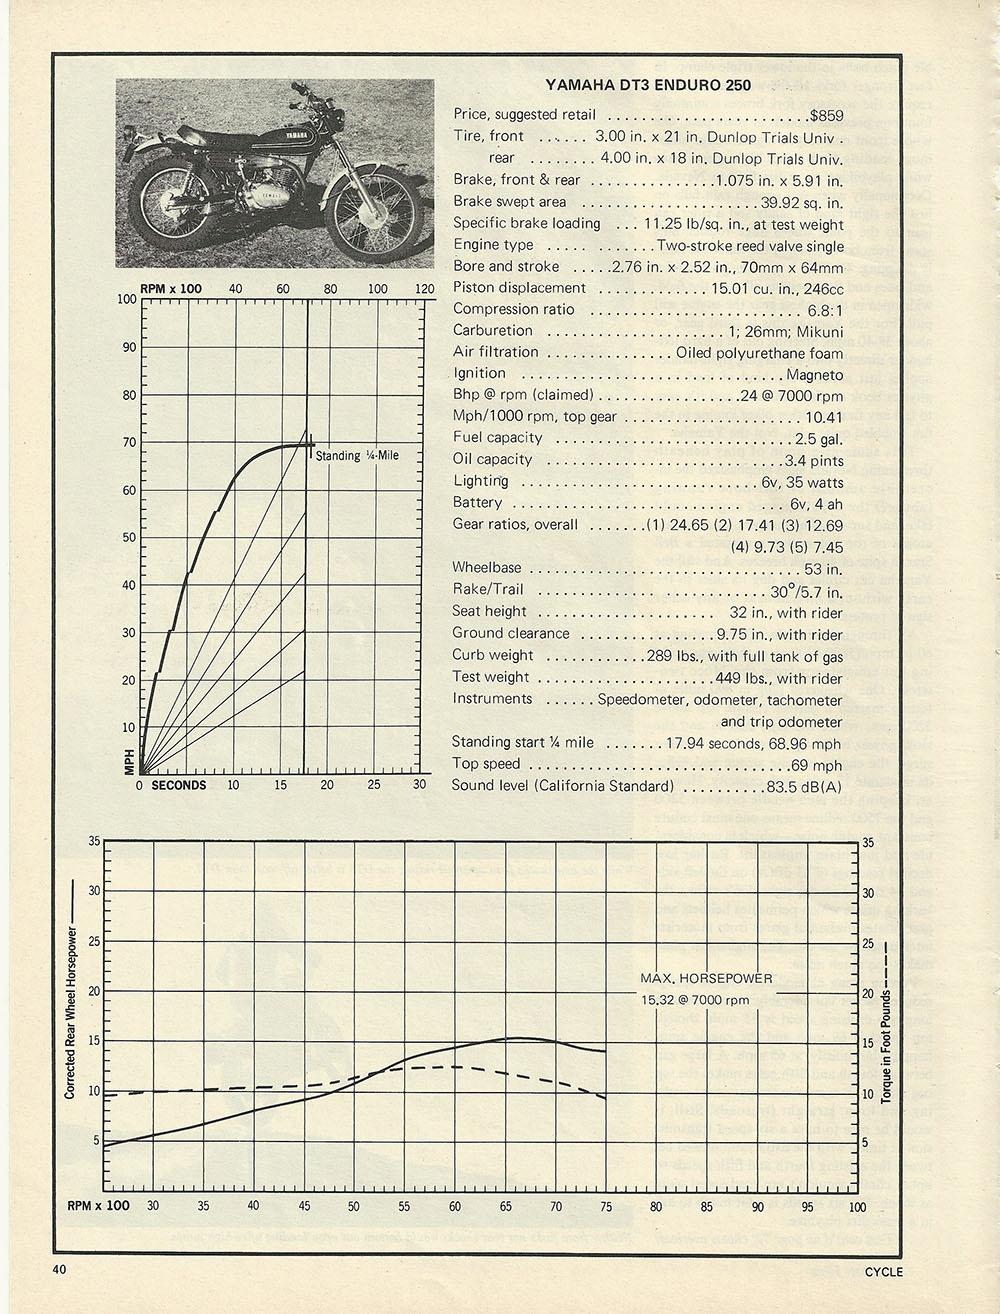 1973 Yamaha DT3 Enduro 250 road test p4.JPG